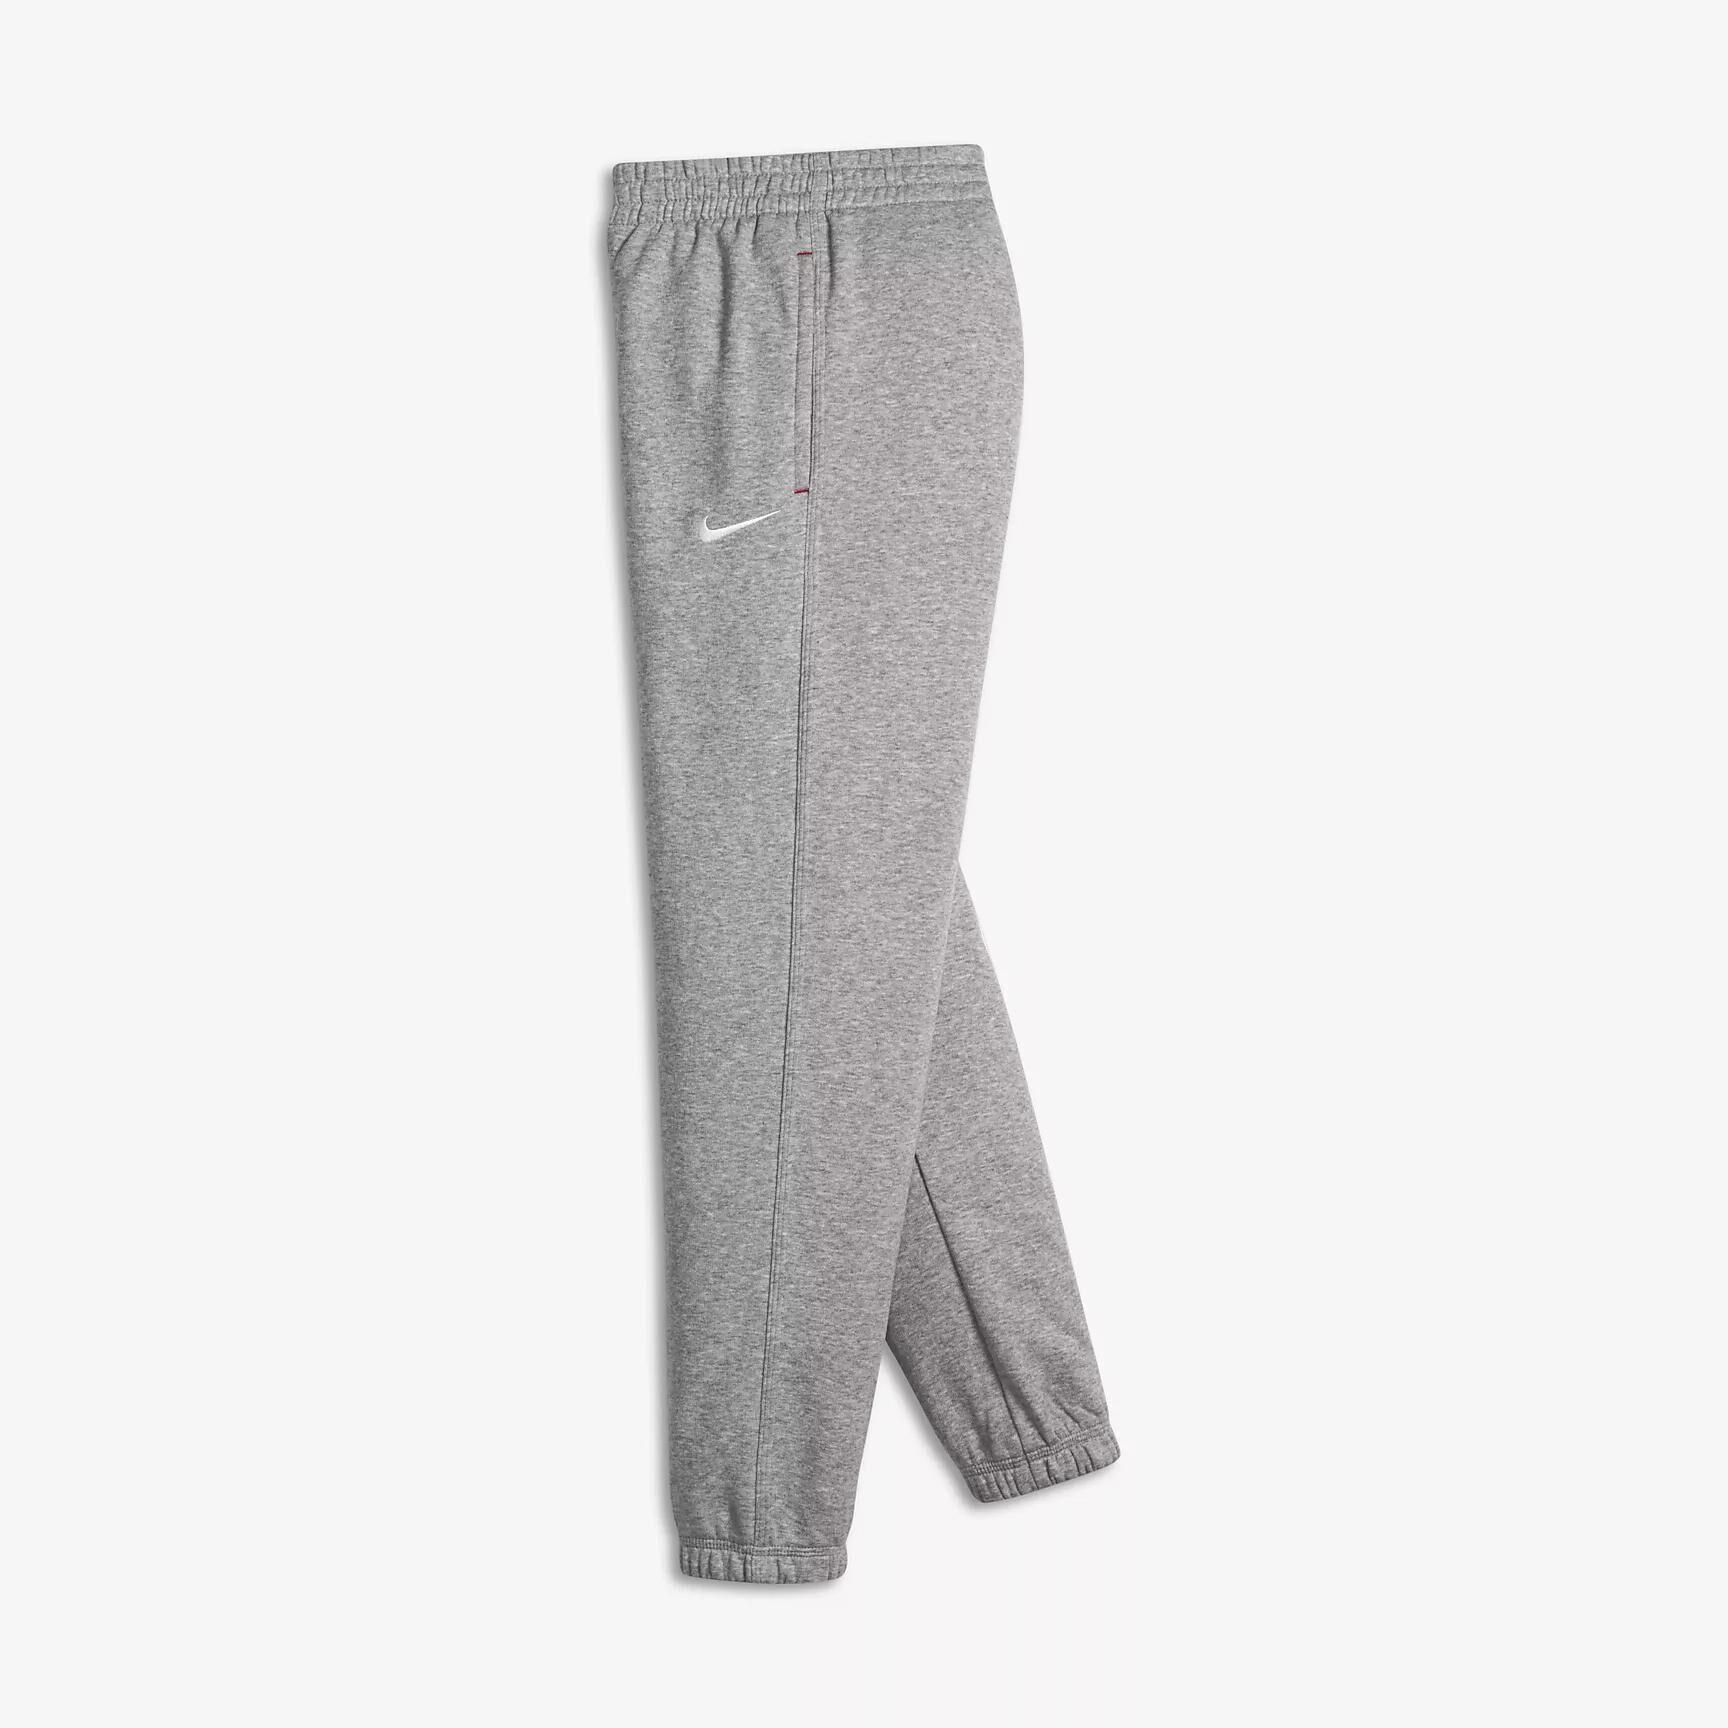 Nike Pantalone  Nike Junior  18/19